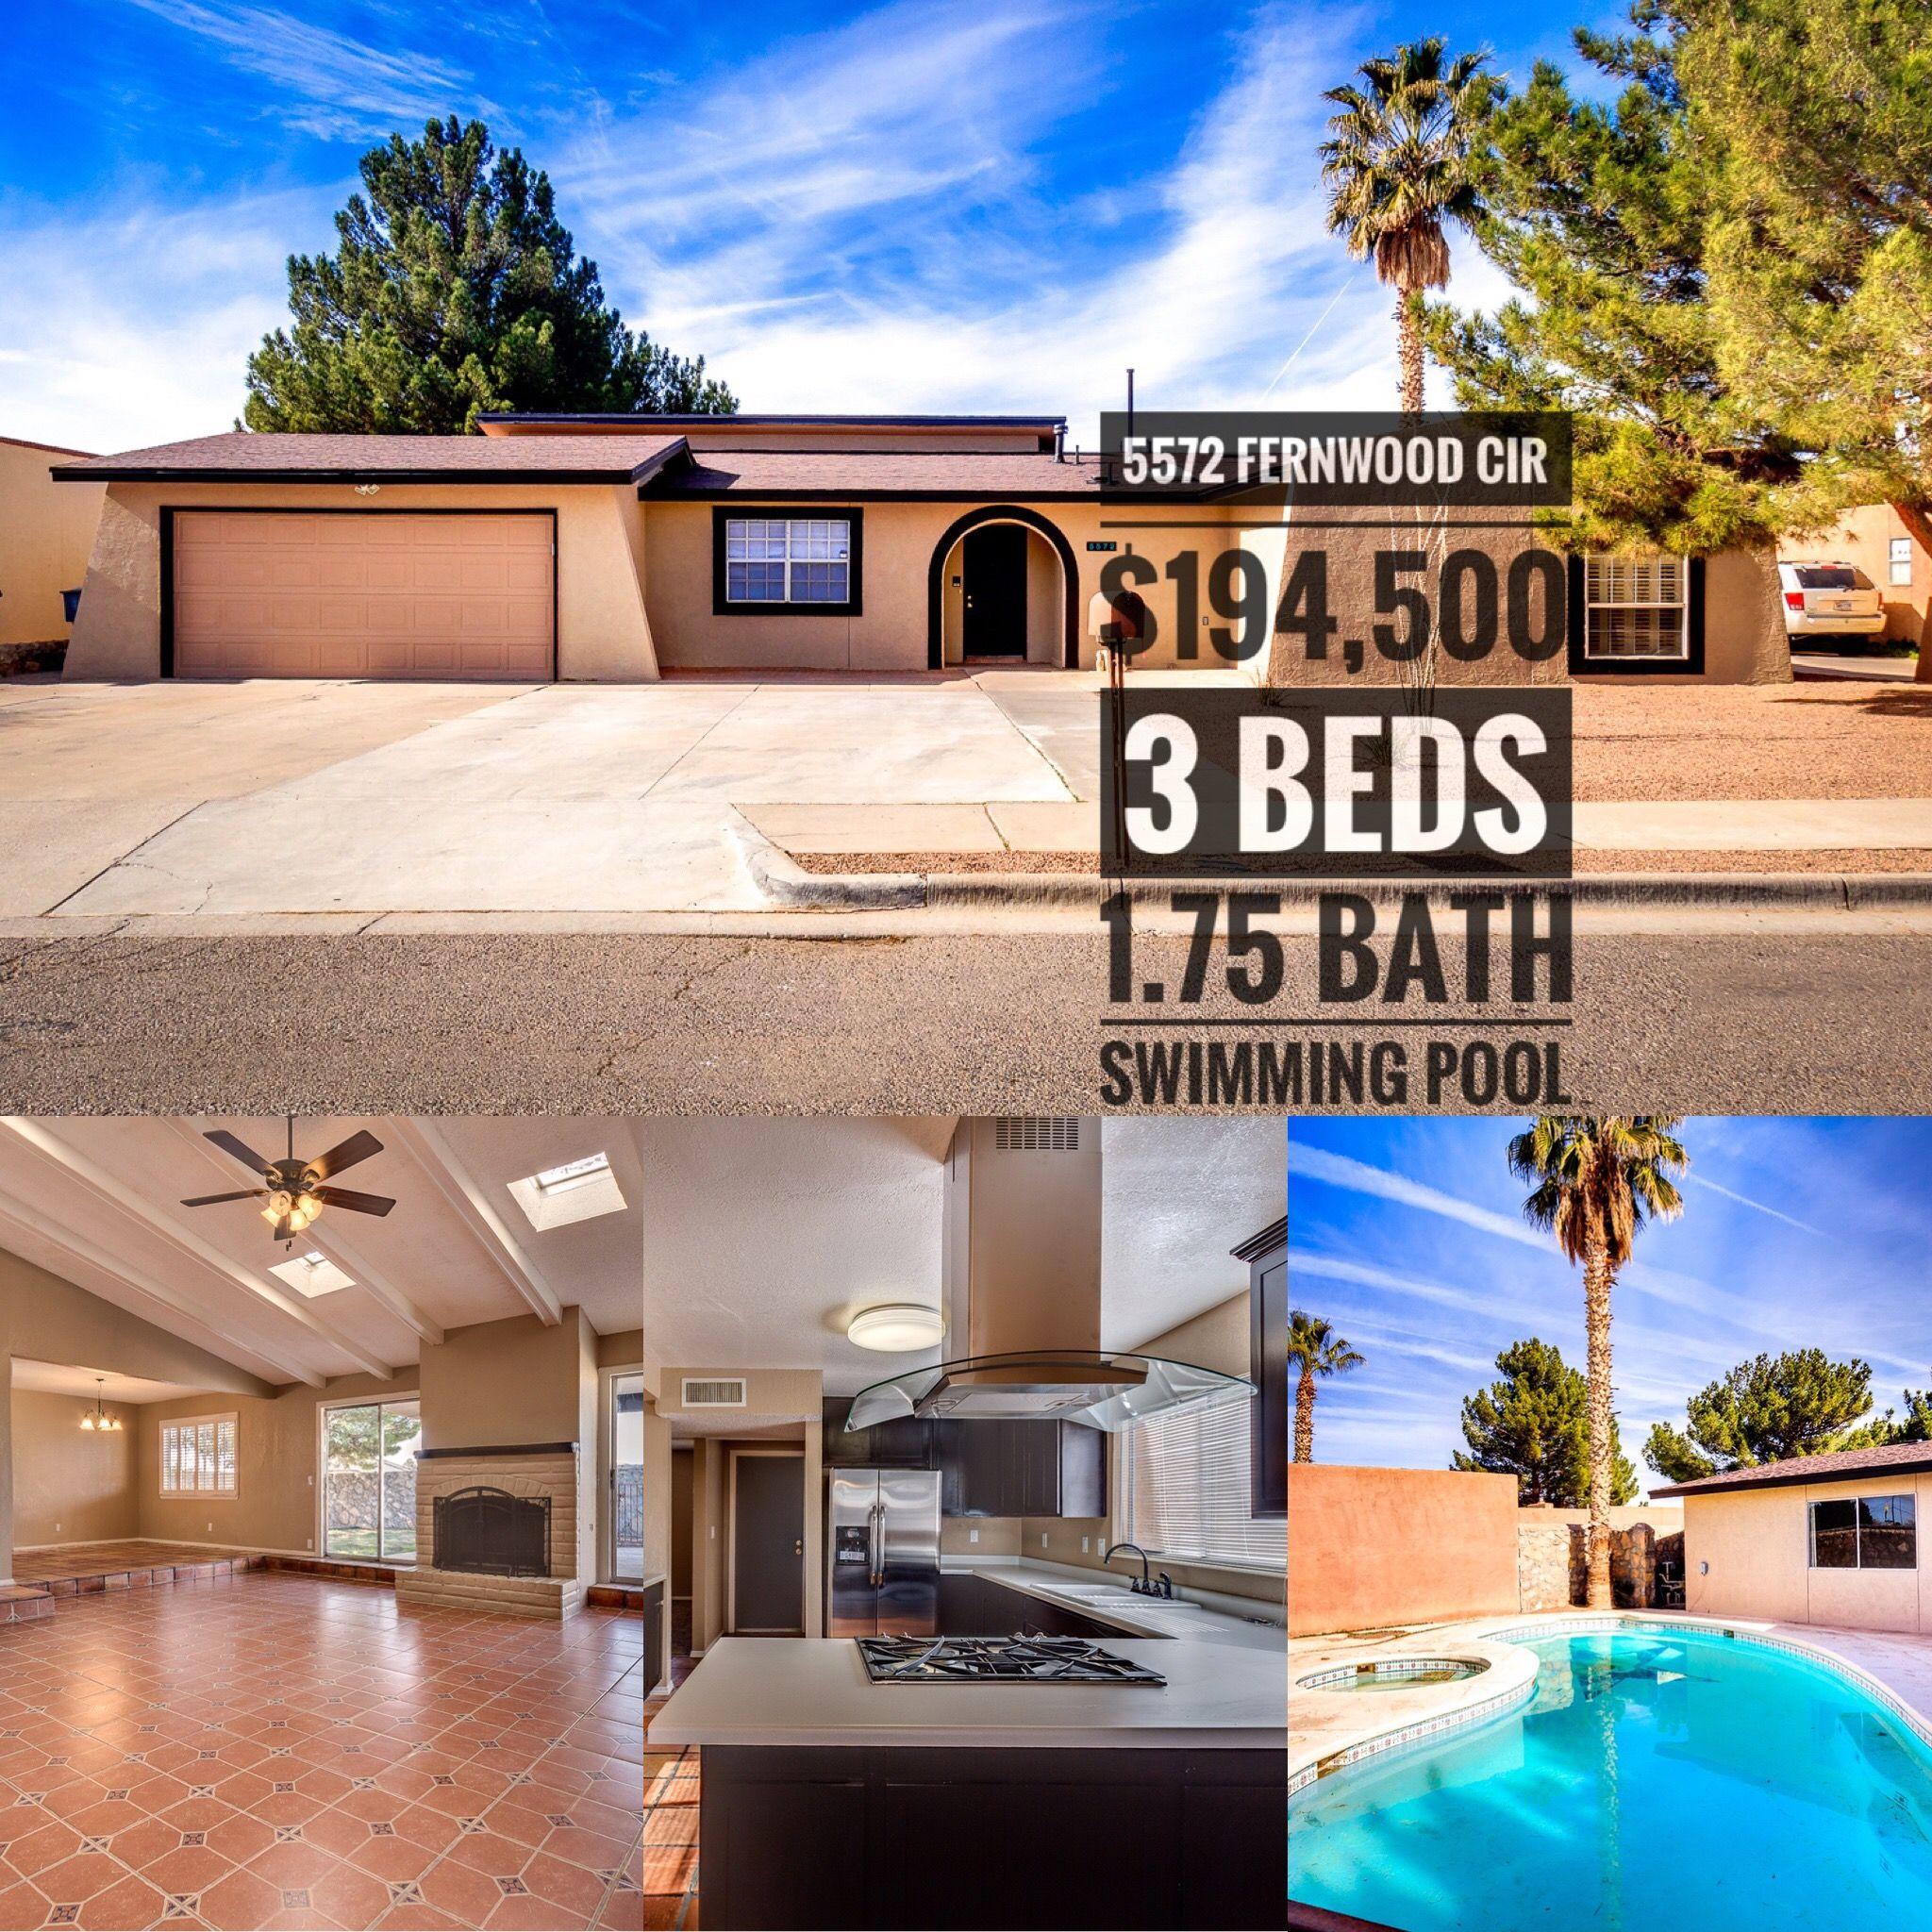 5572 Fernwood El Paso Tx 79932 Elpaso Elpasotx Westelpaso Itsallgoodep Rental Rentalhome Rentalproperty House Rental Rental Property Renting A House